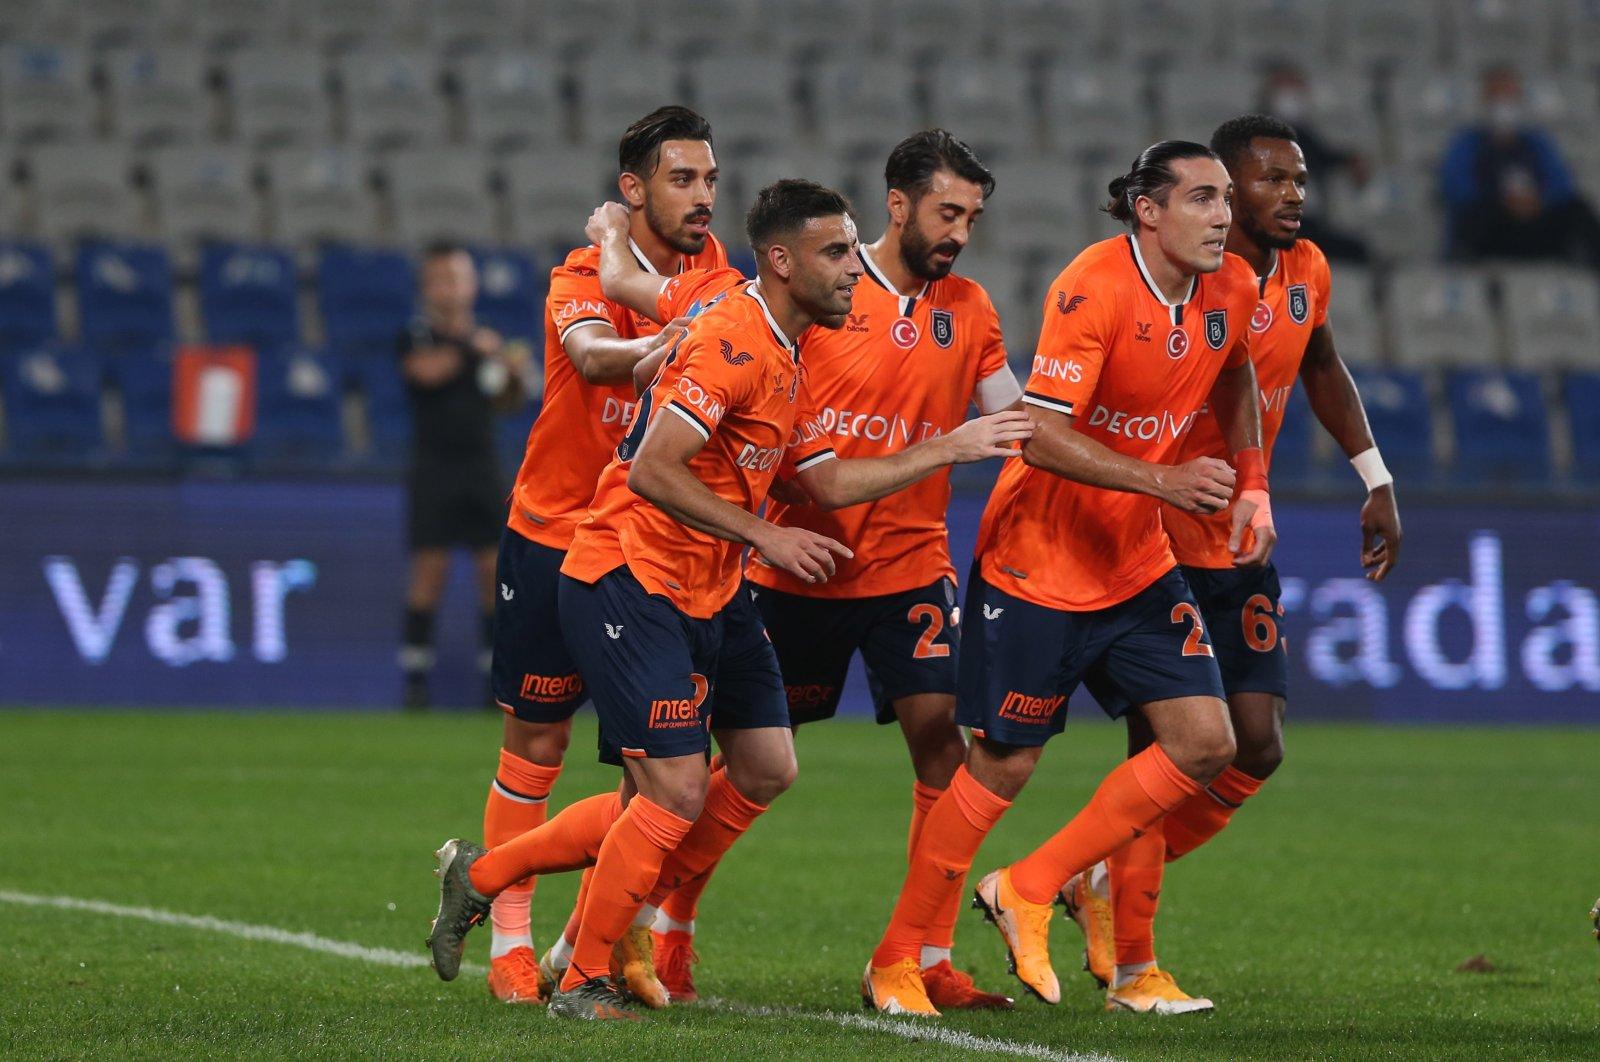 Başakşehir players celebrate a goal during a Süper Lig match against Antalyaspor, in Istanbul, Turkey, Oct. 24, 2020. (AA Photo)